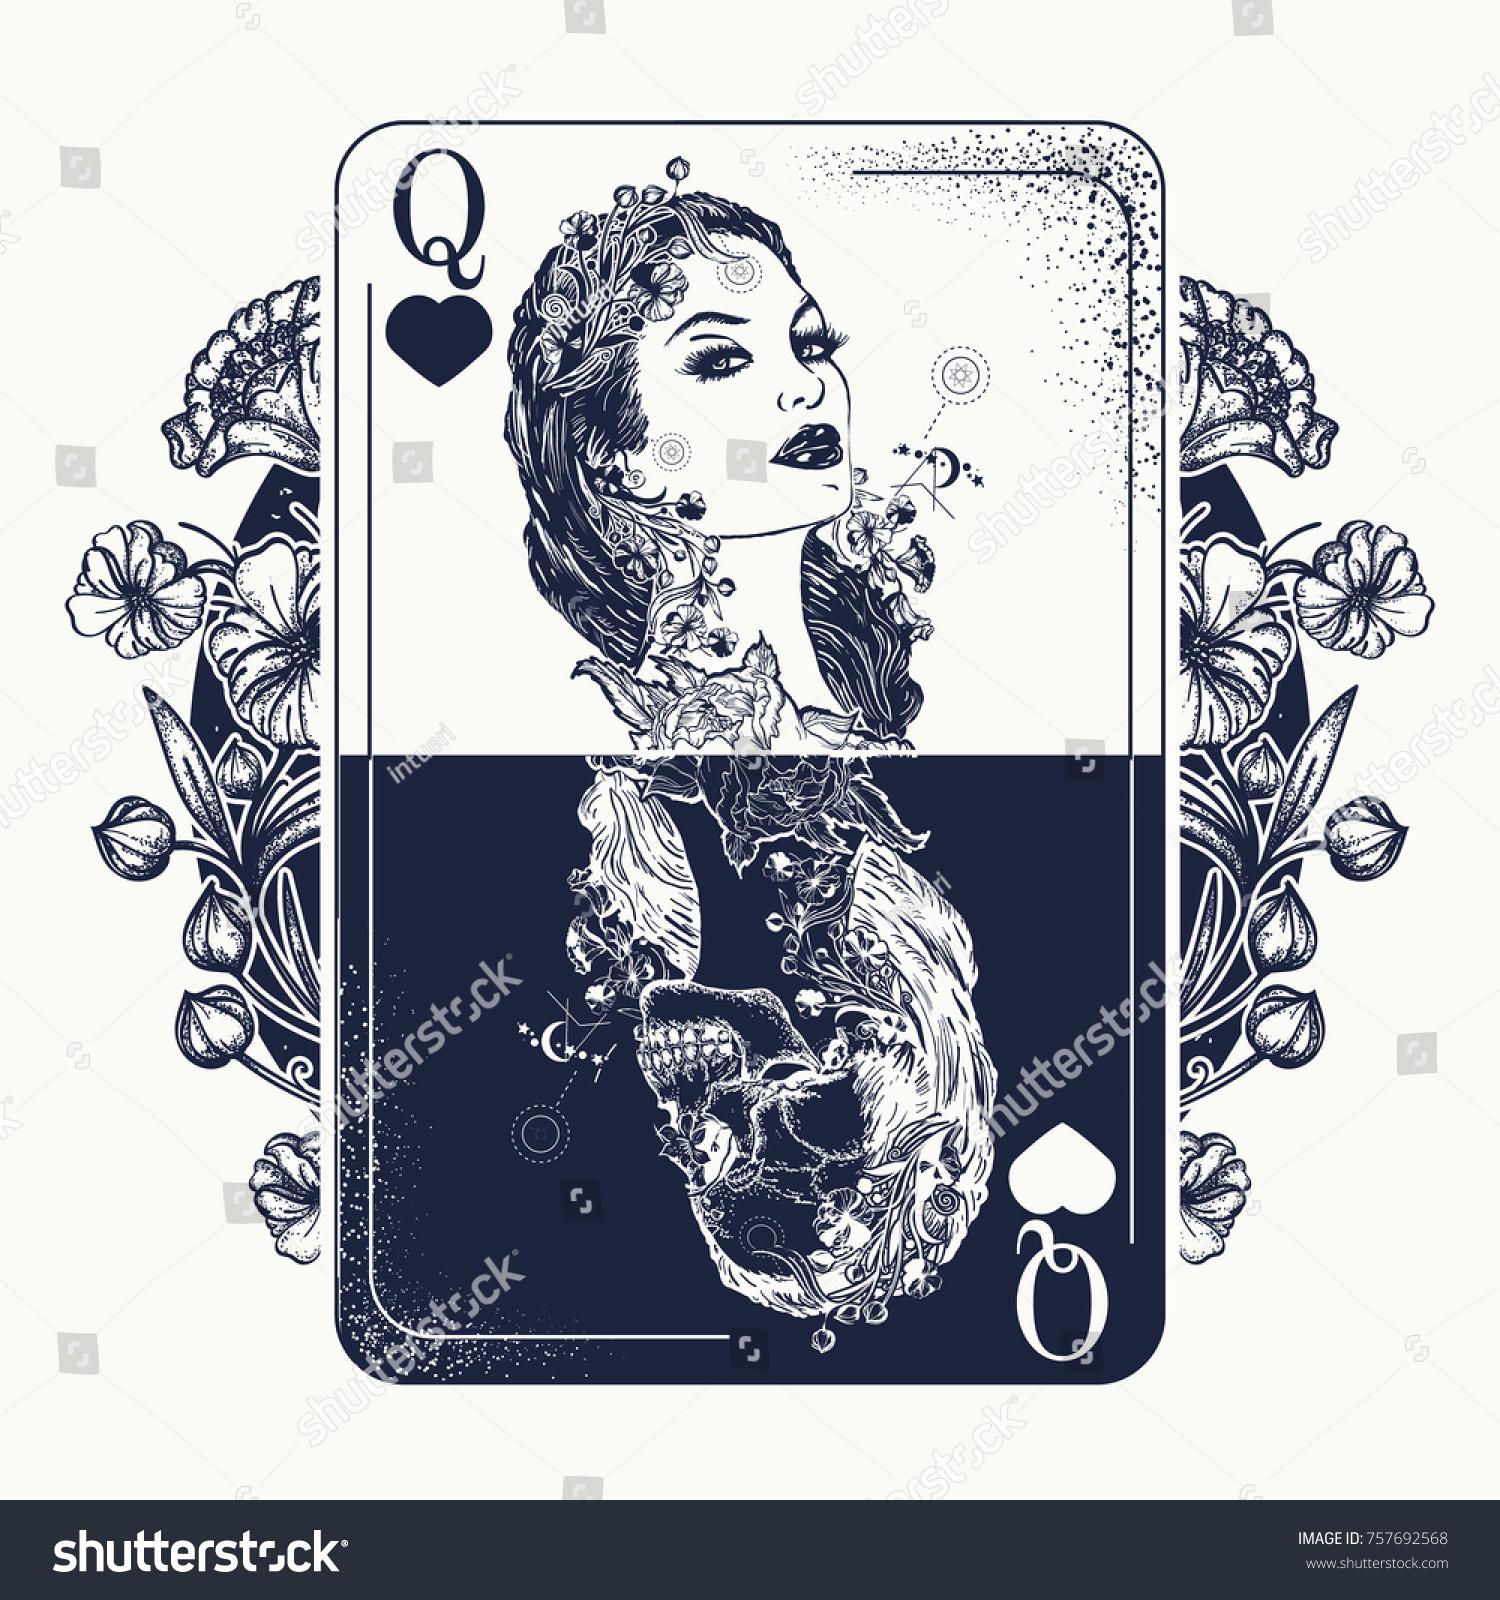 Queen Playing Card Art Nouveau Flowers 757692568